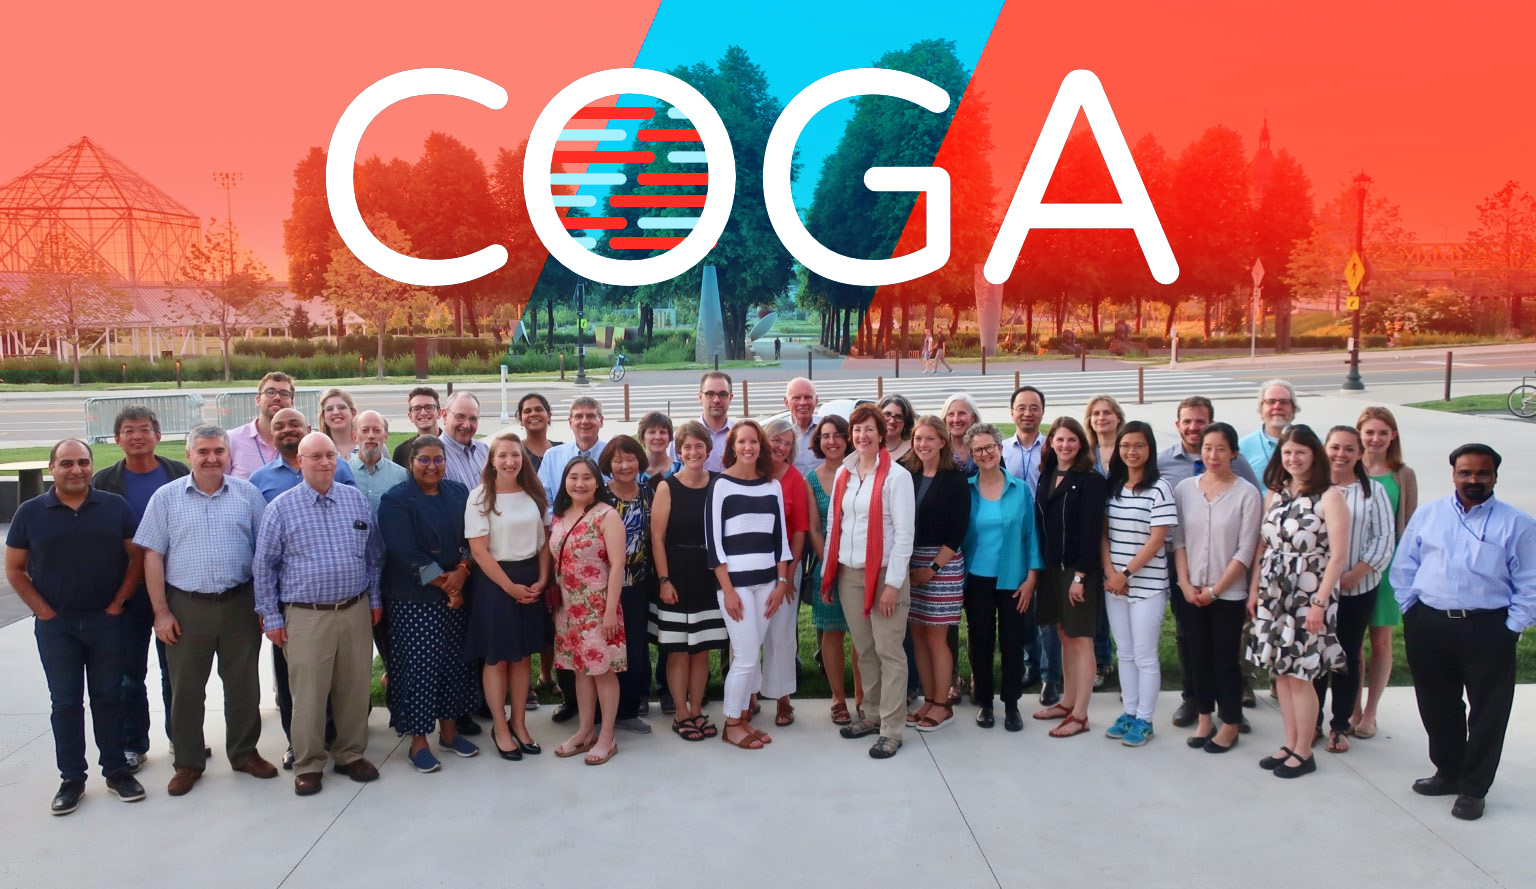 A portrait of the COGA participants with the COGA logo.